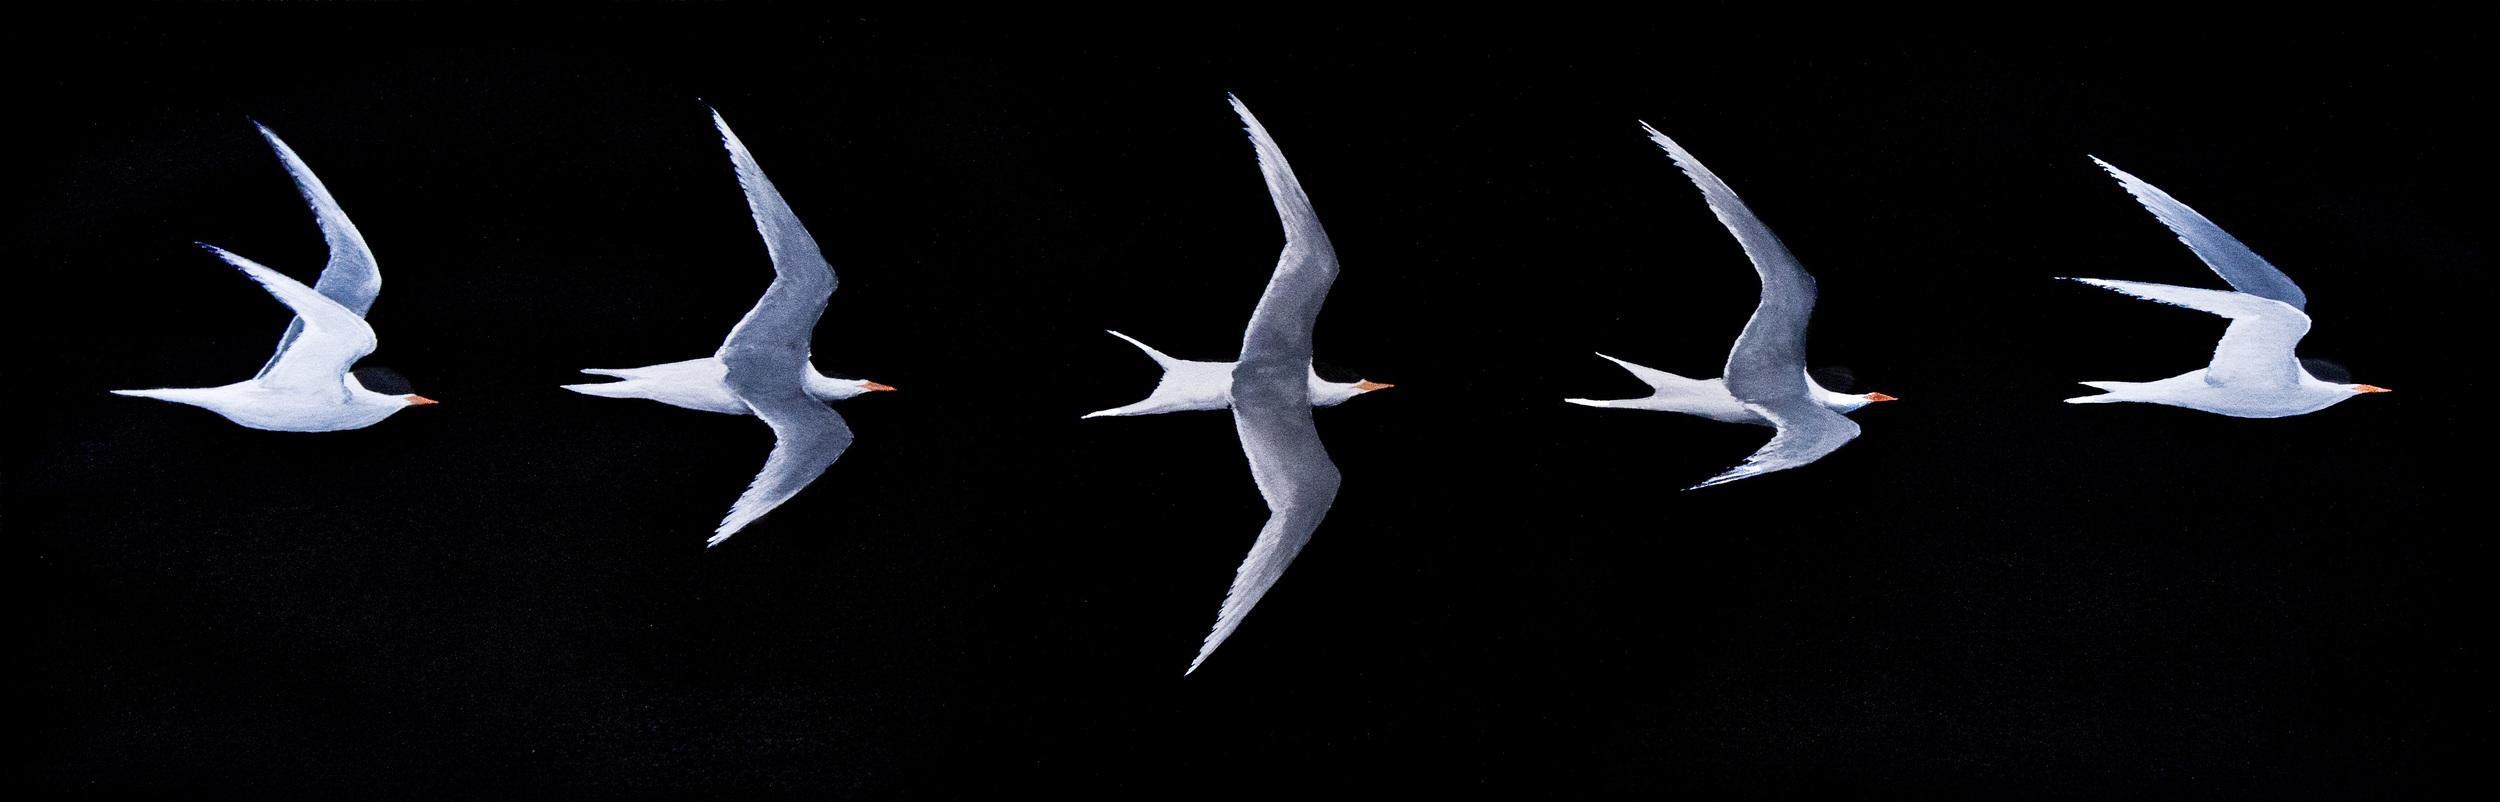 TernFlight.jpg